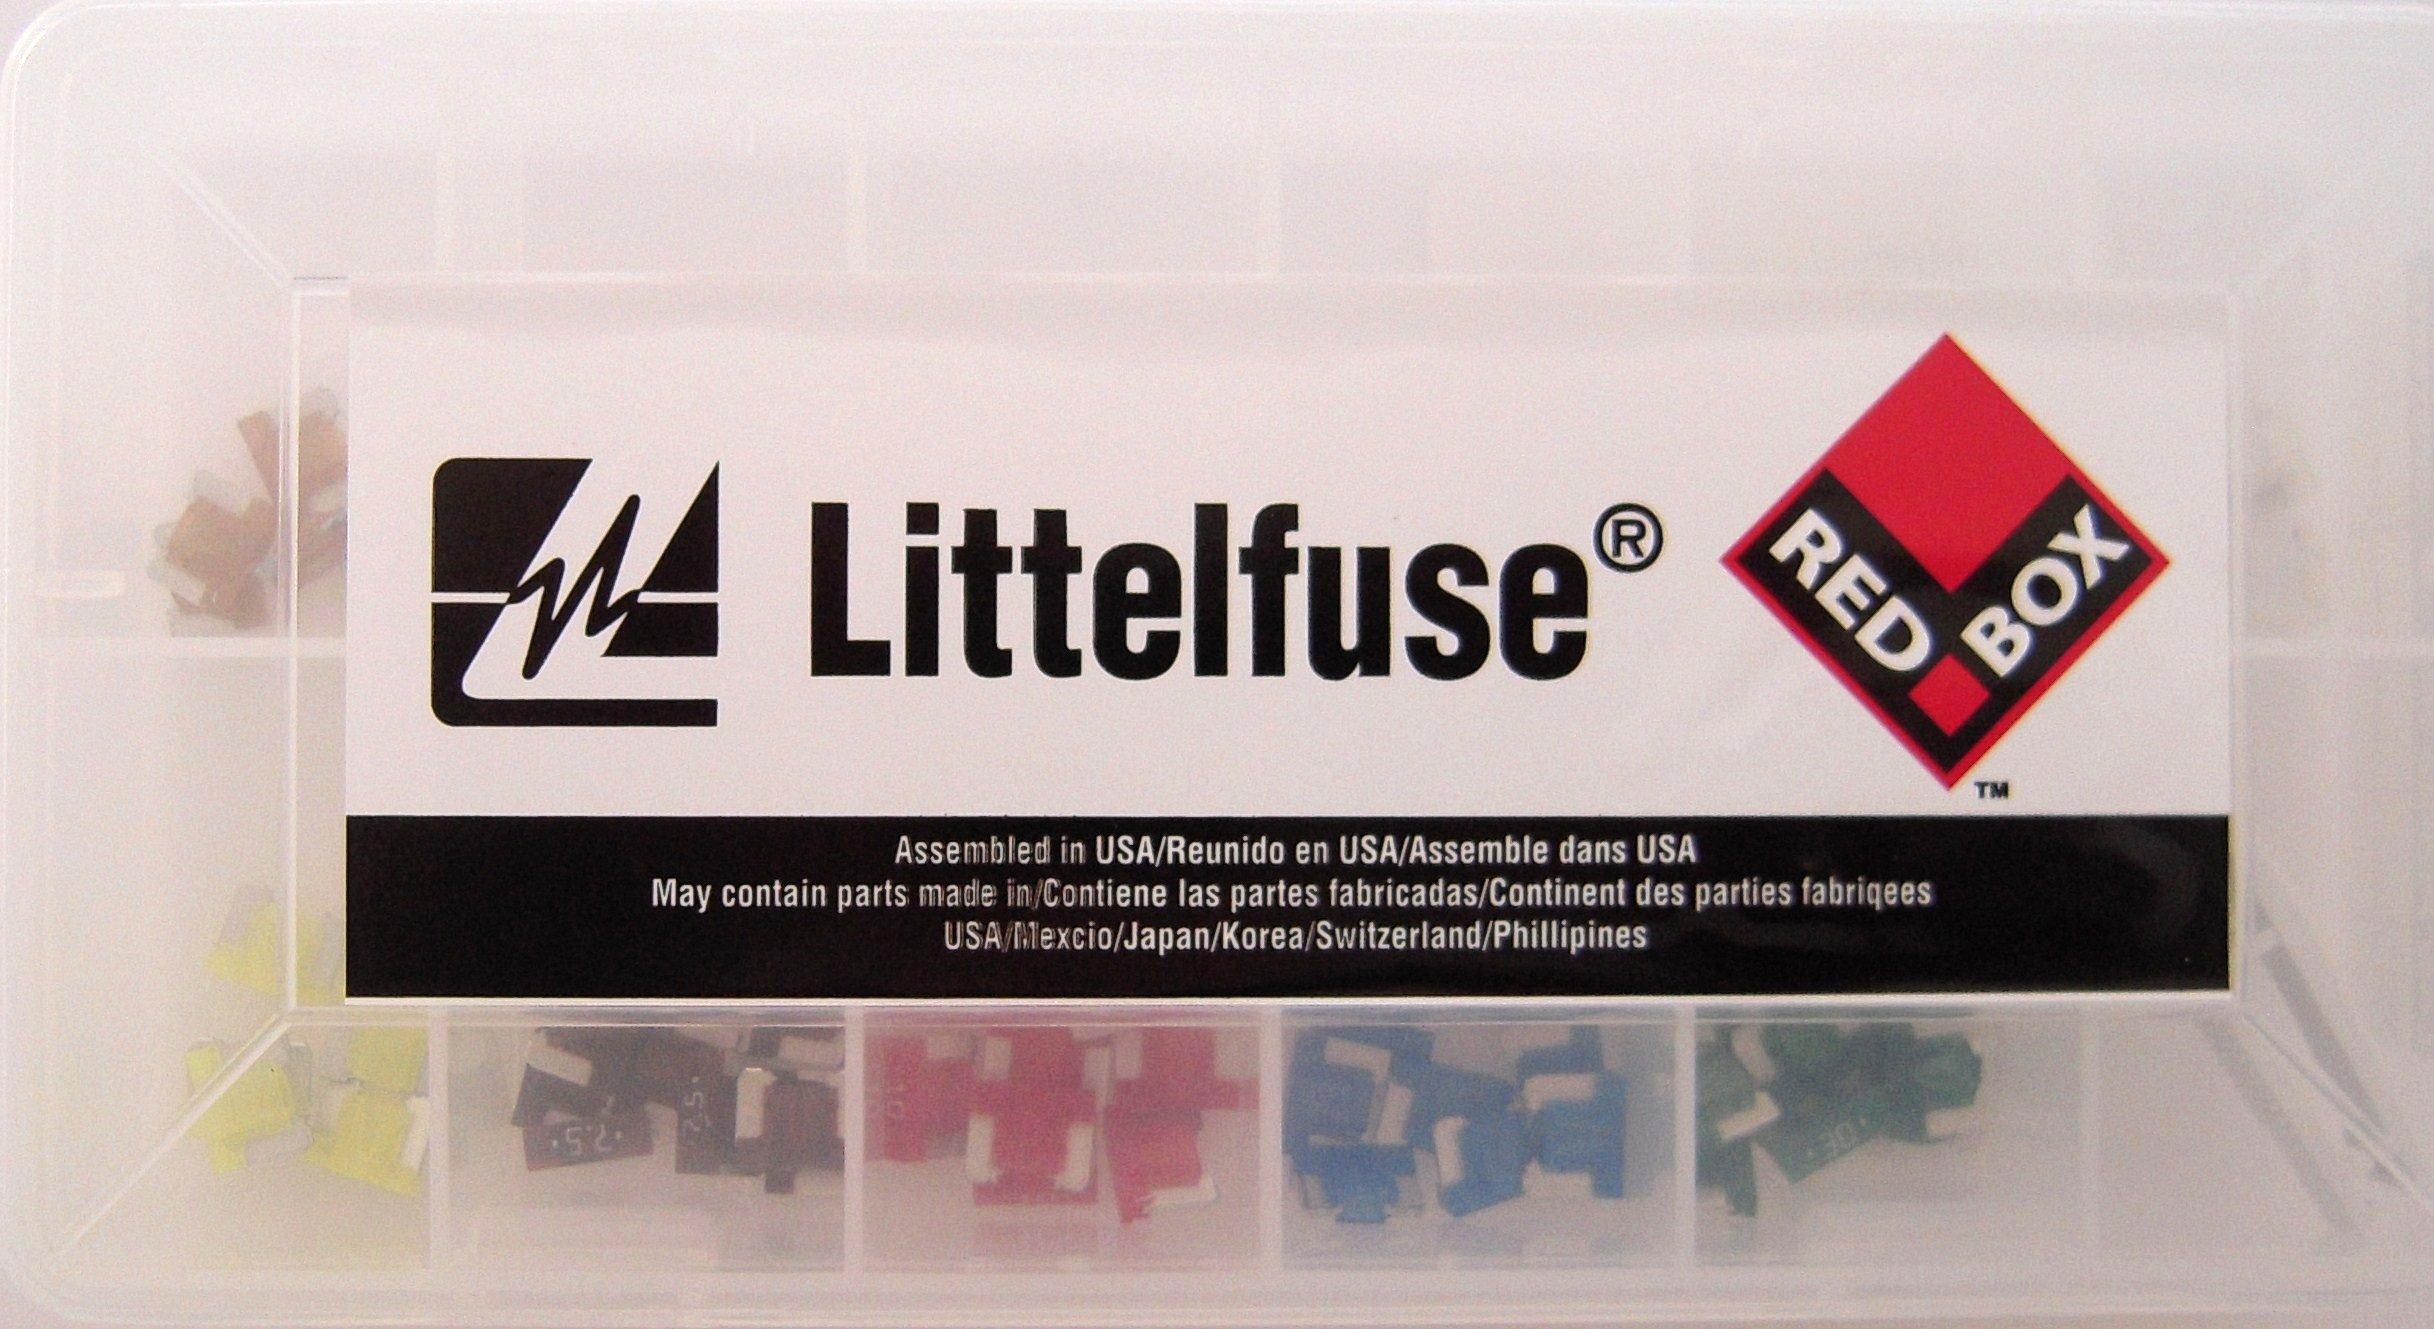 Littelfuse RBOX1 Redbox MINI Low Profile Fuse Module